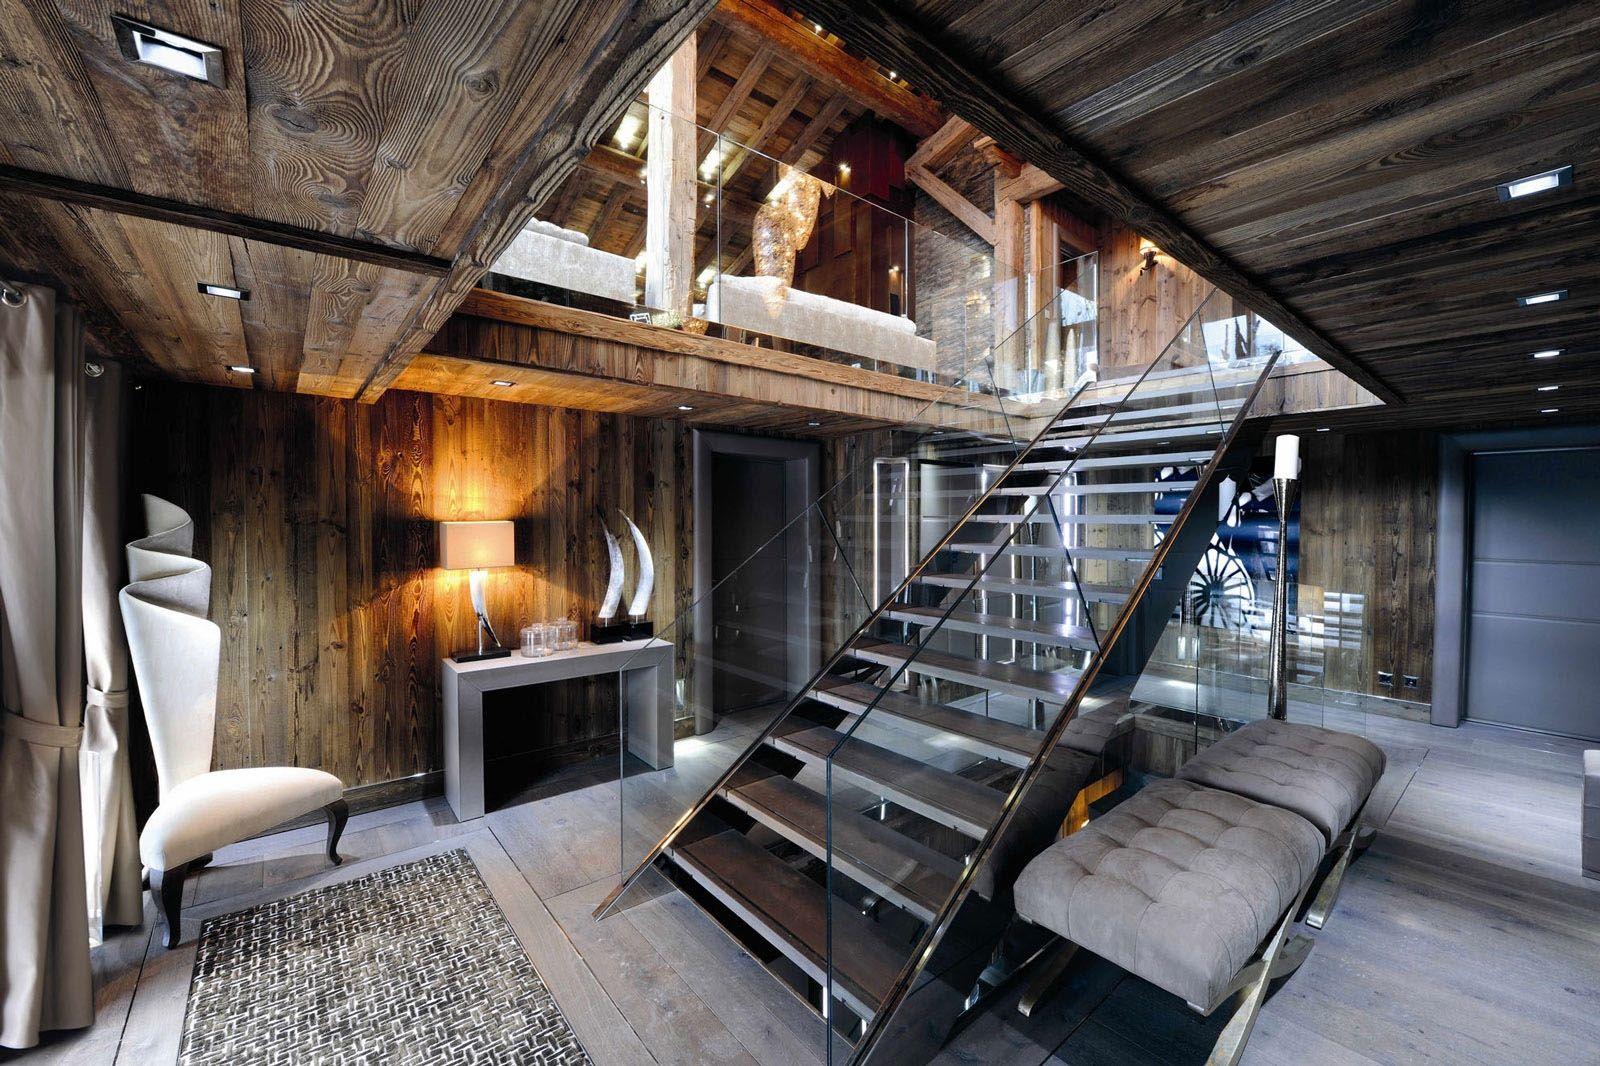 Marvelous interior design rustic modern as rustic modern interiors